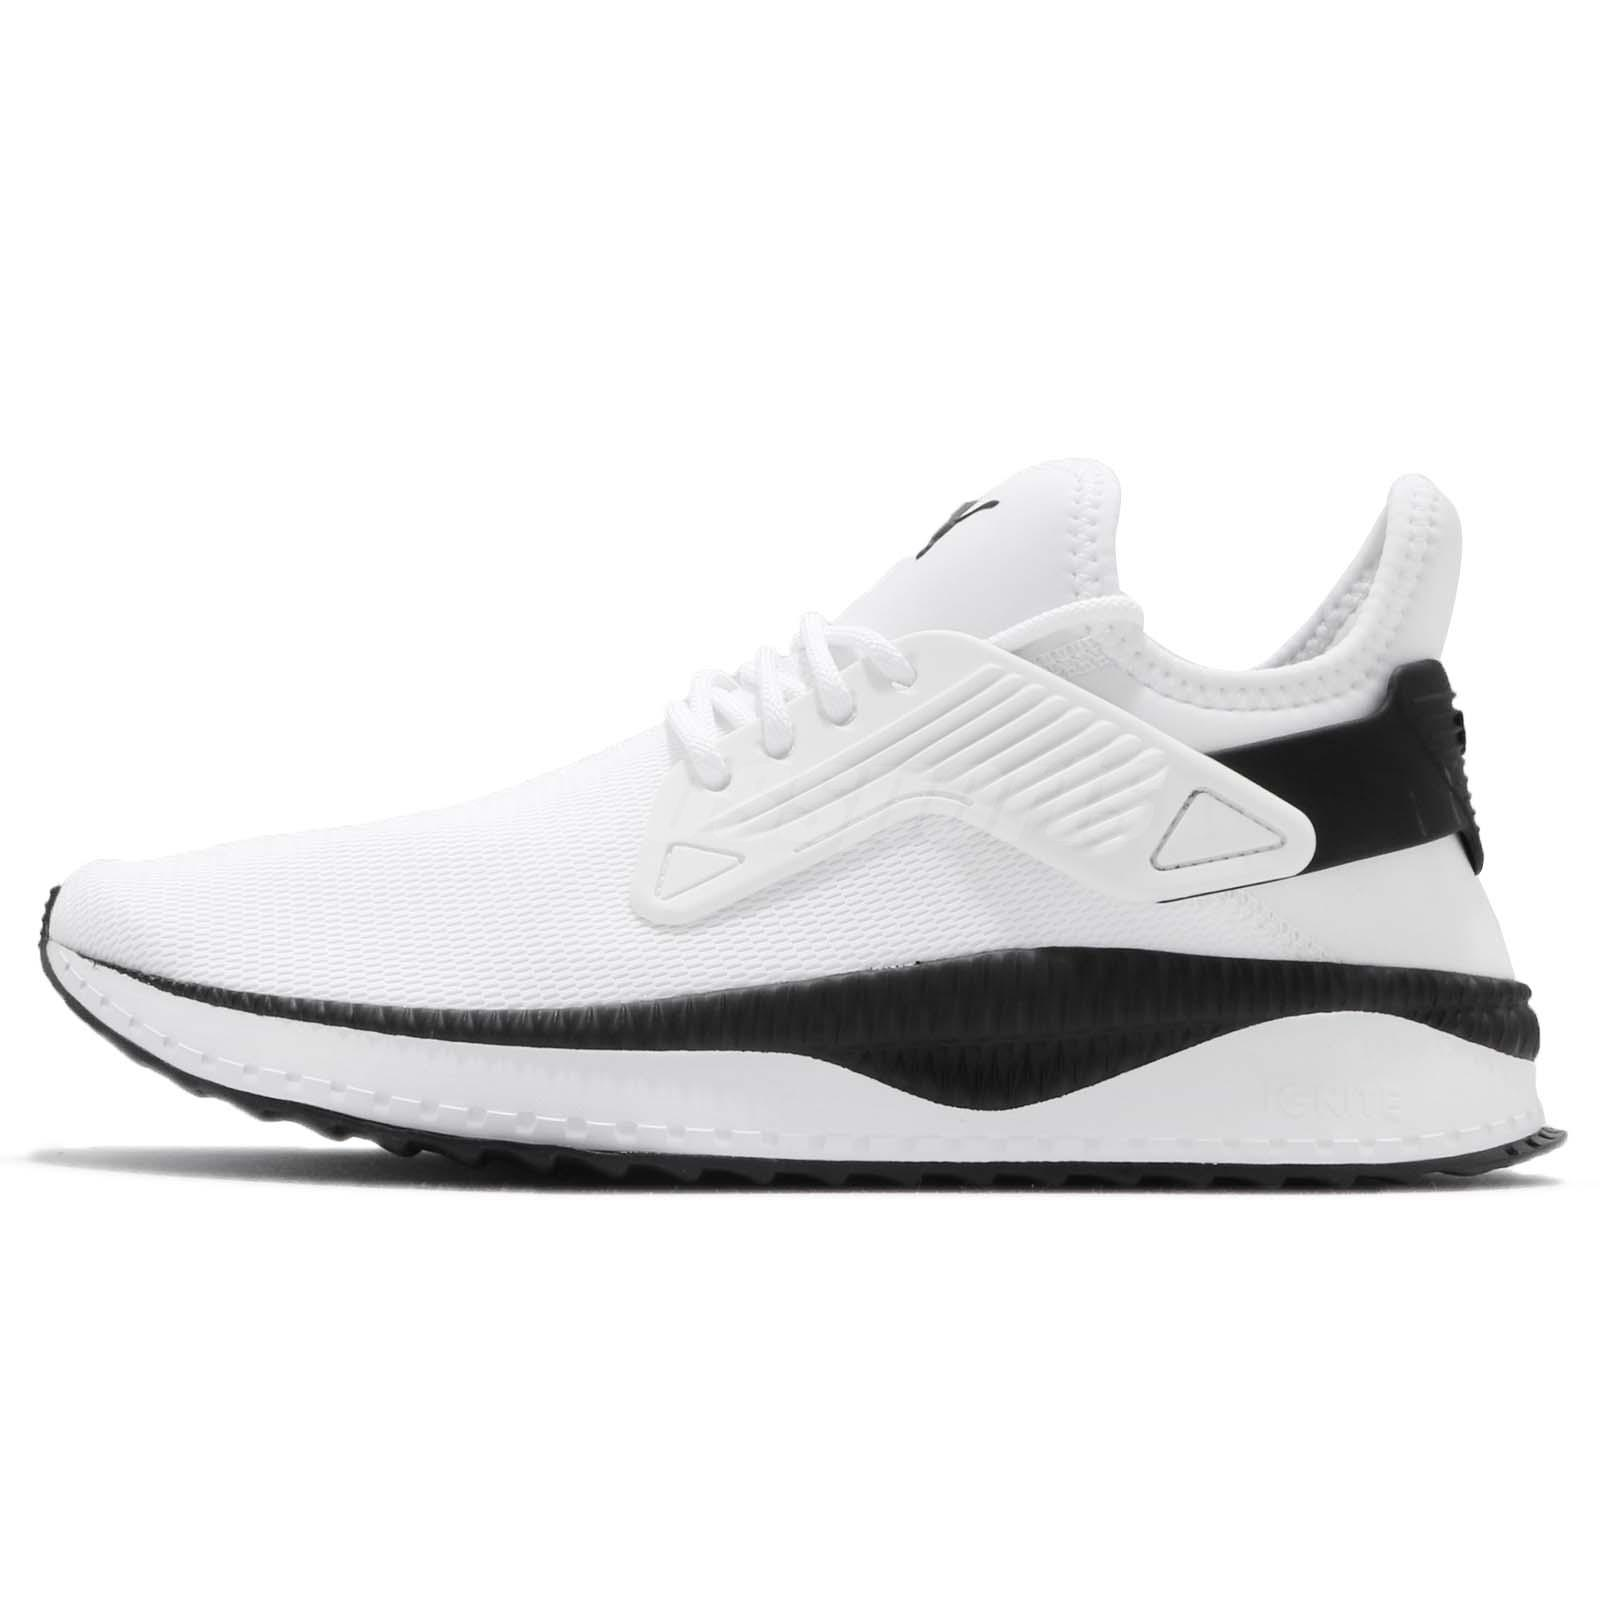 950ce1b4723c8c Puma Tsugi Cage Ignite White Black Men Running Shoes Sneakers 365394 ...